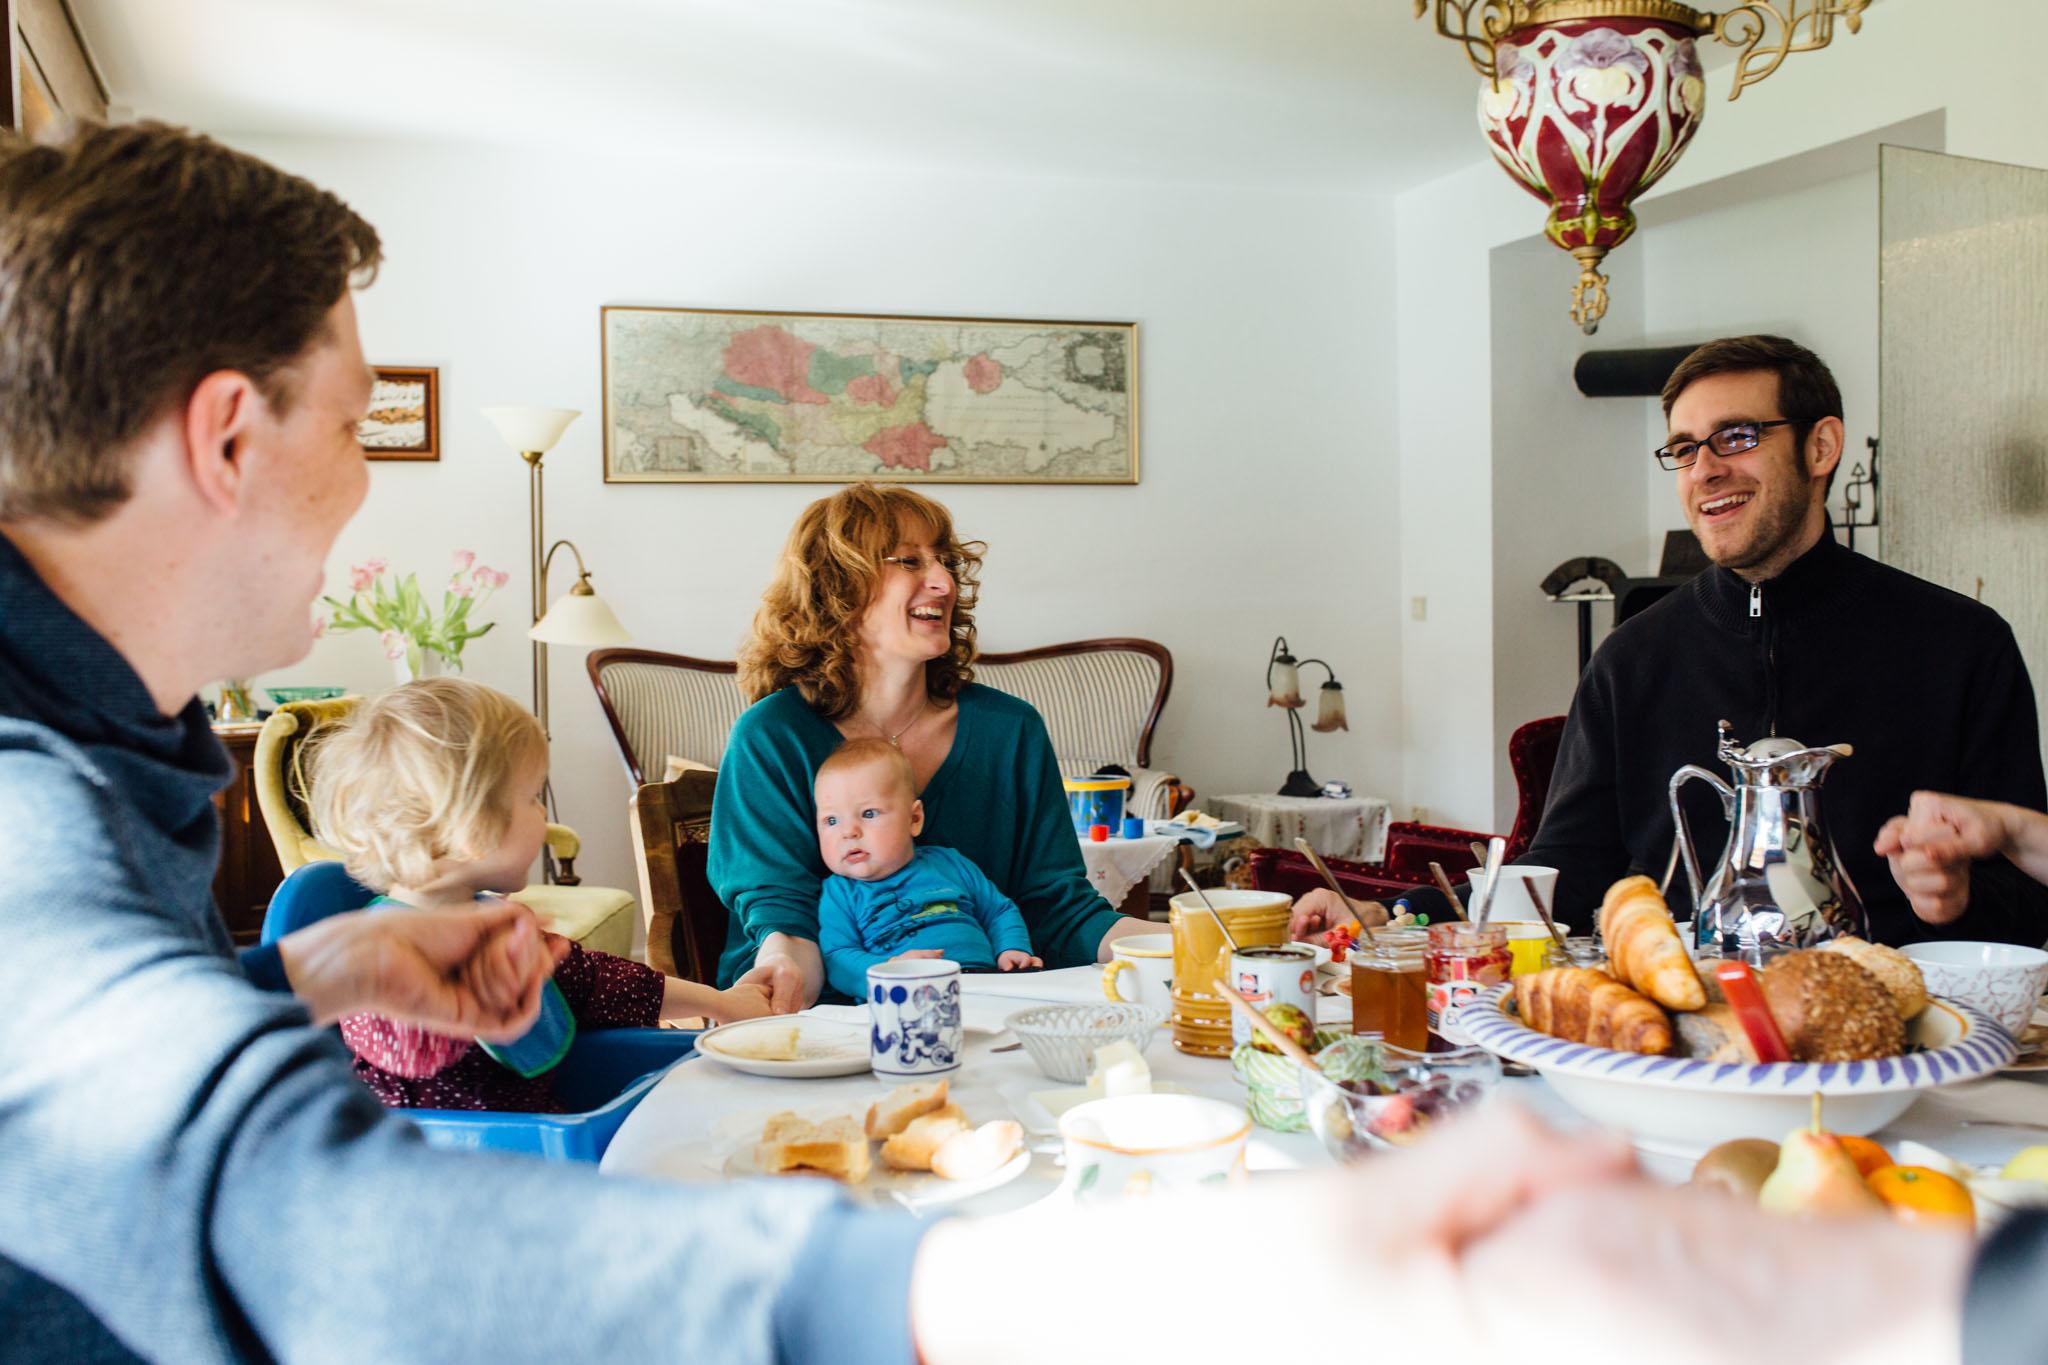 fotoreportage-familie-fotosession-berlin